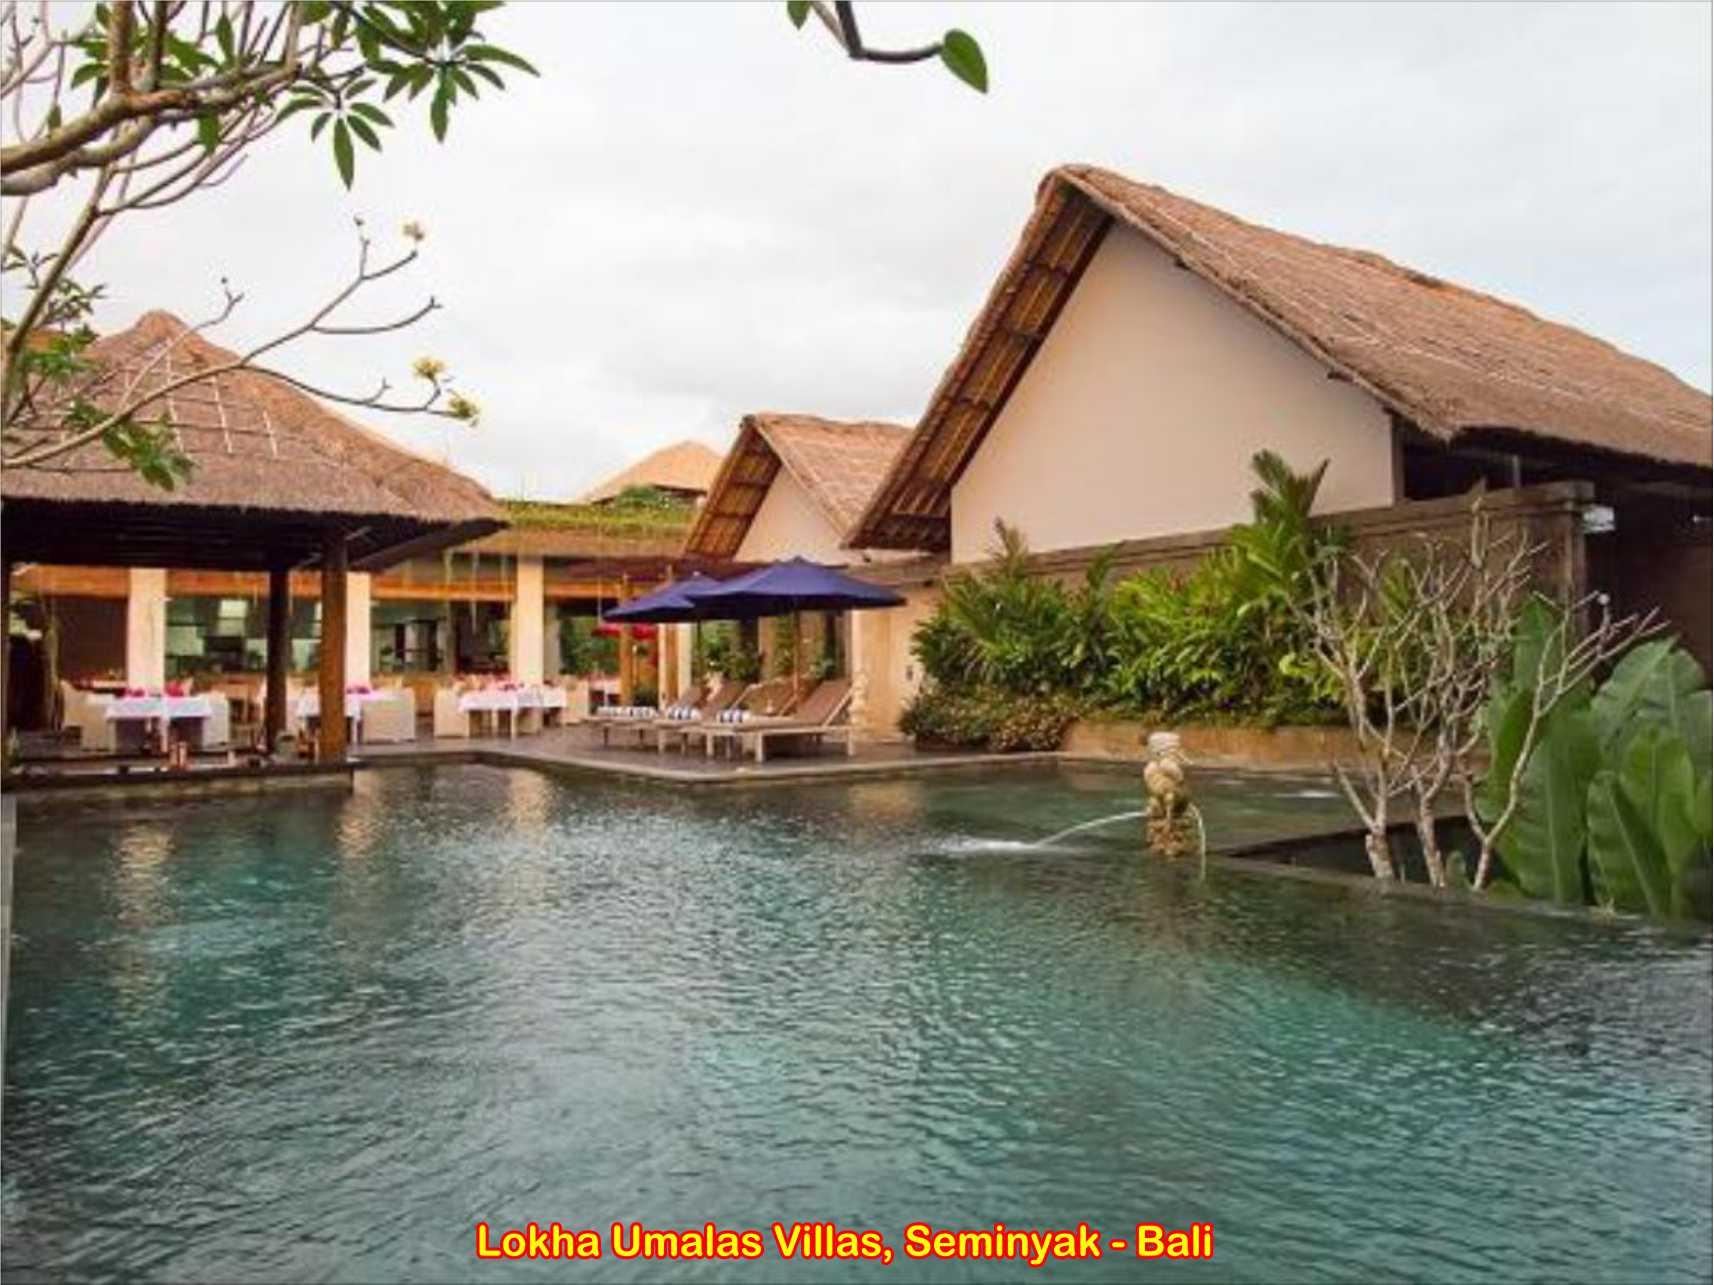 The Lokha Umalas Villas Seminyak, Bali - Indonesia 1